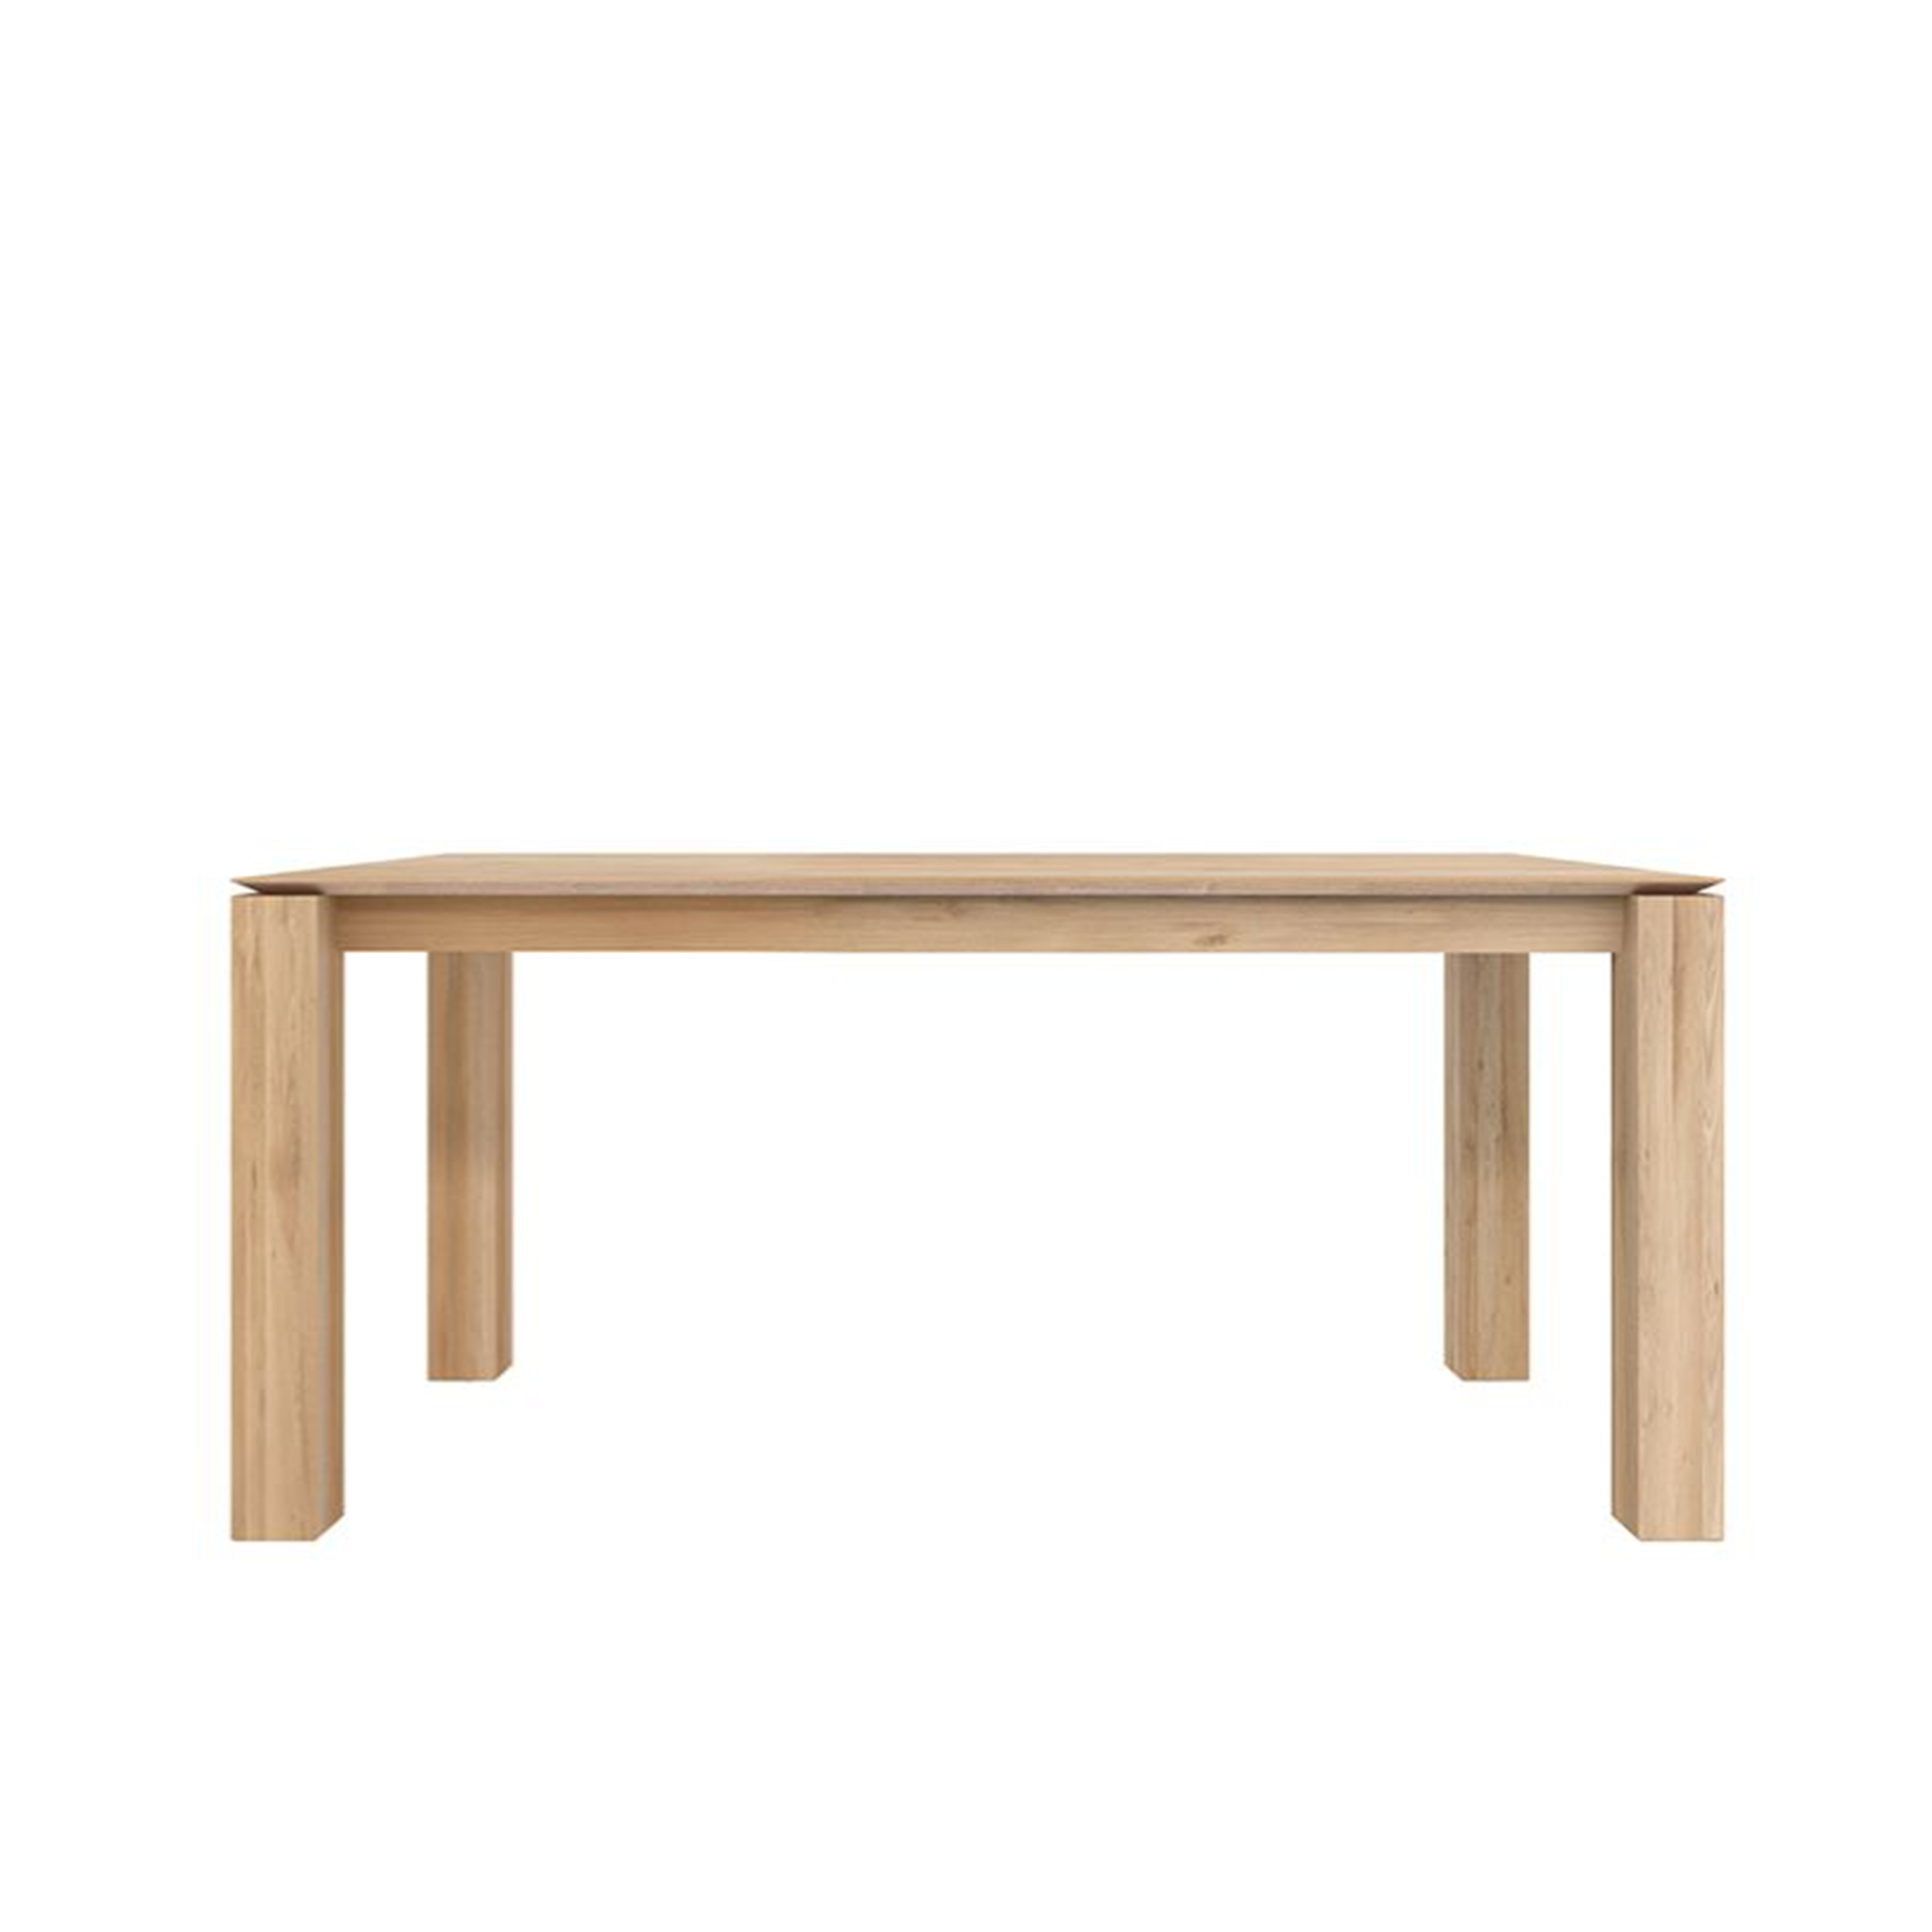 TGE-050570-Oak-Slice-dining-table-140x90x77_f.jpg.png